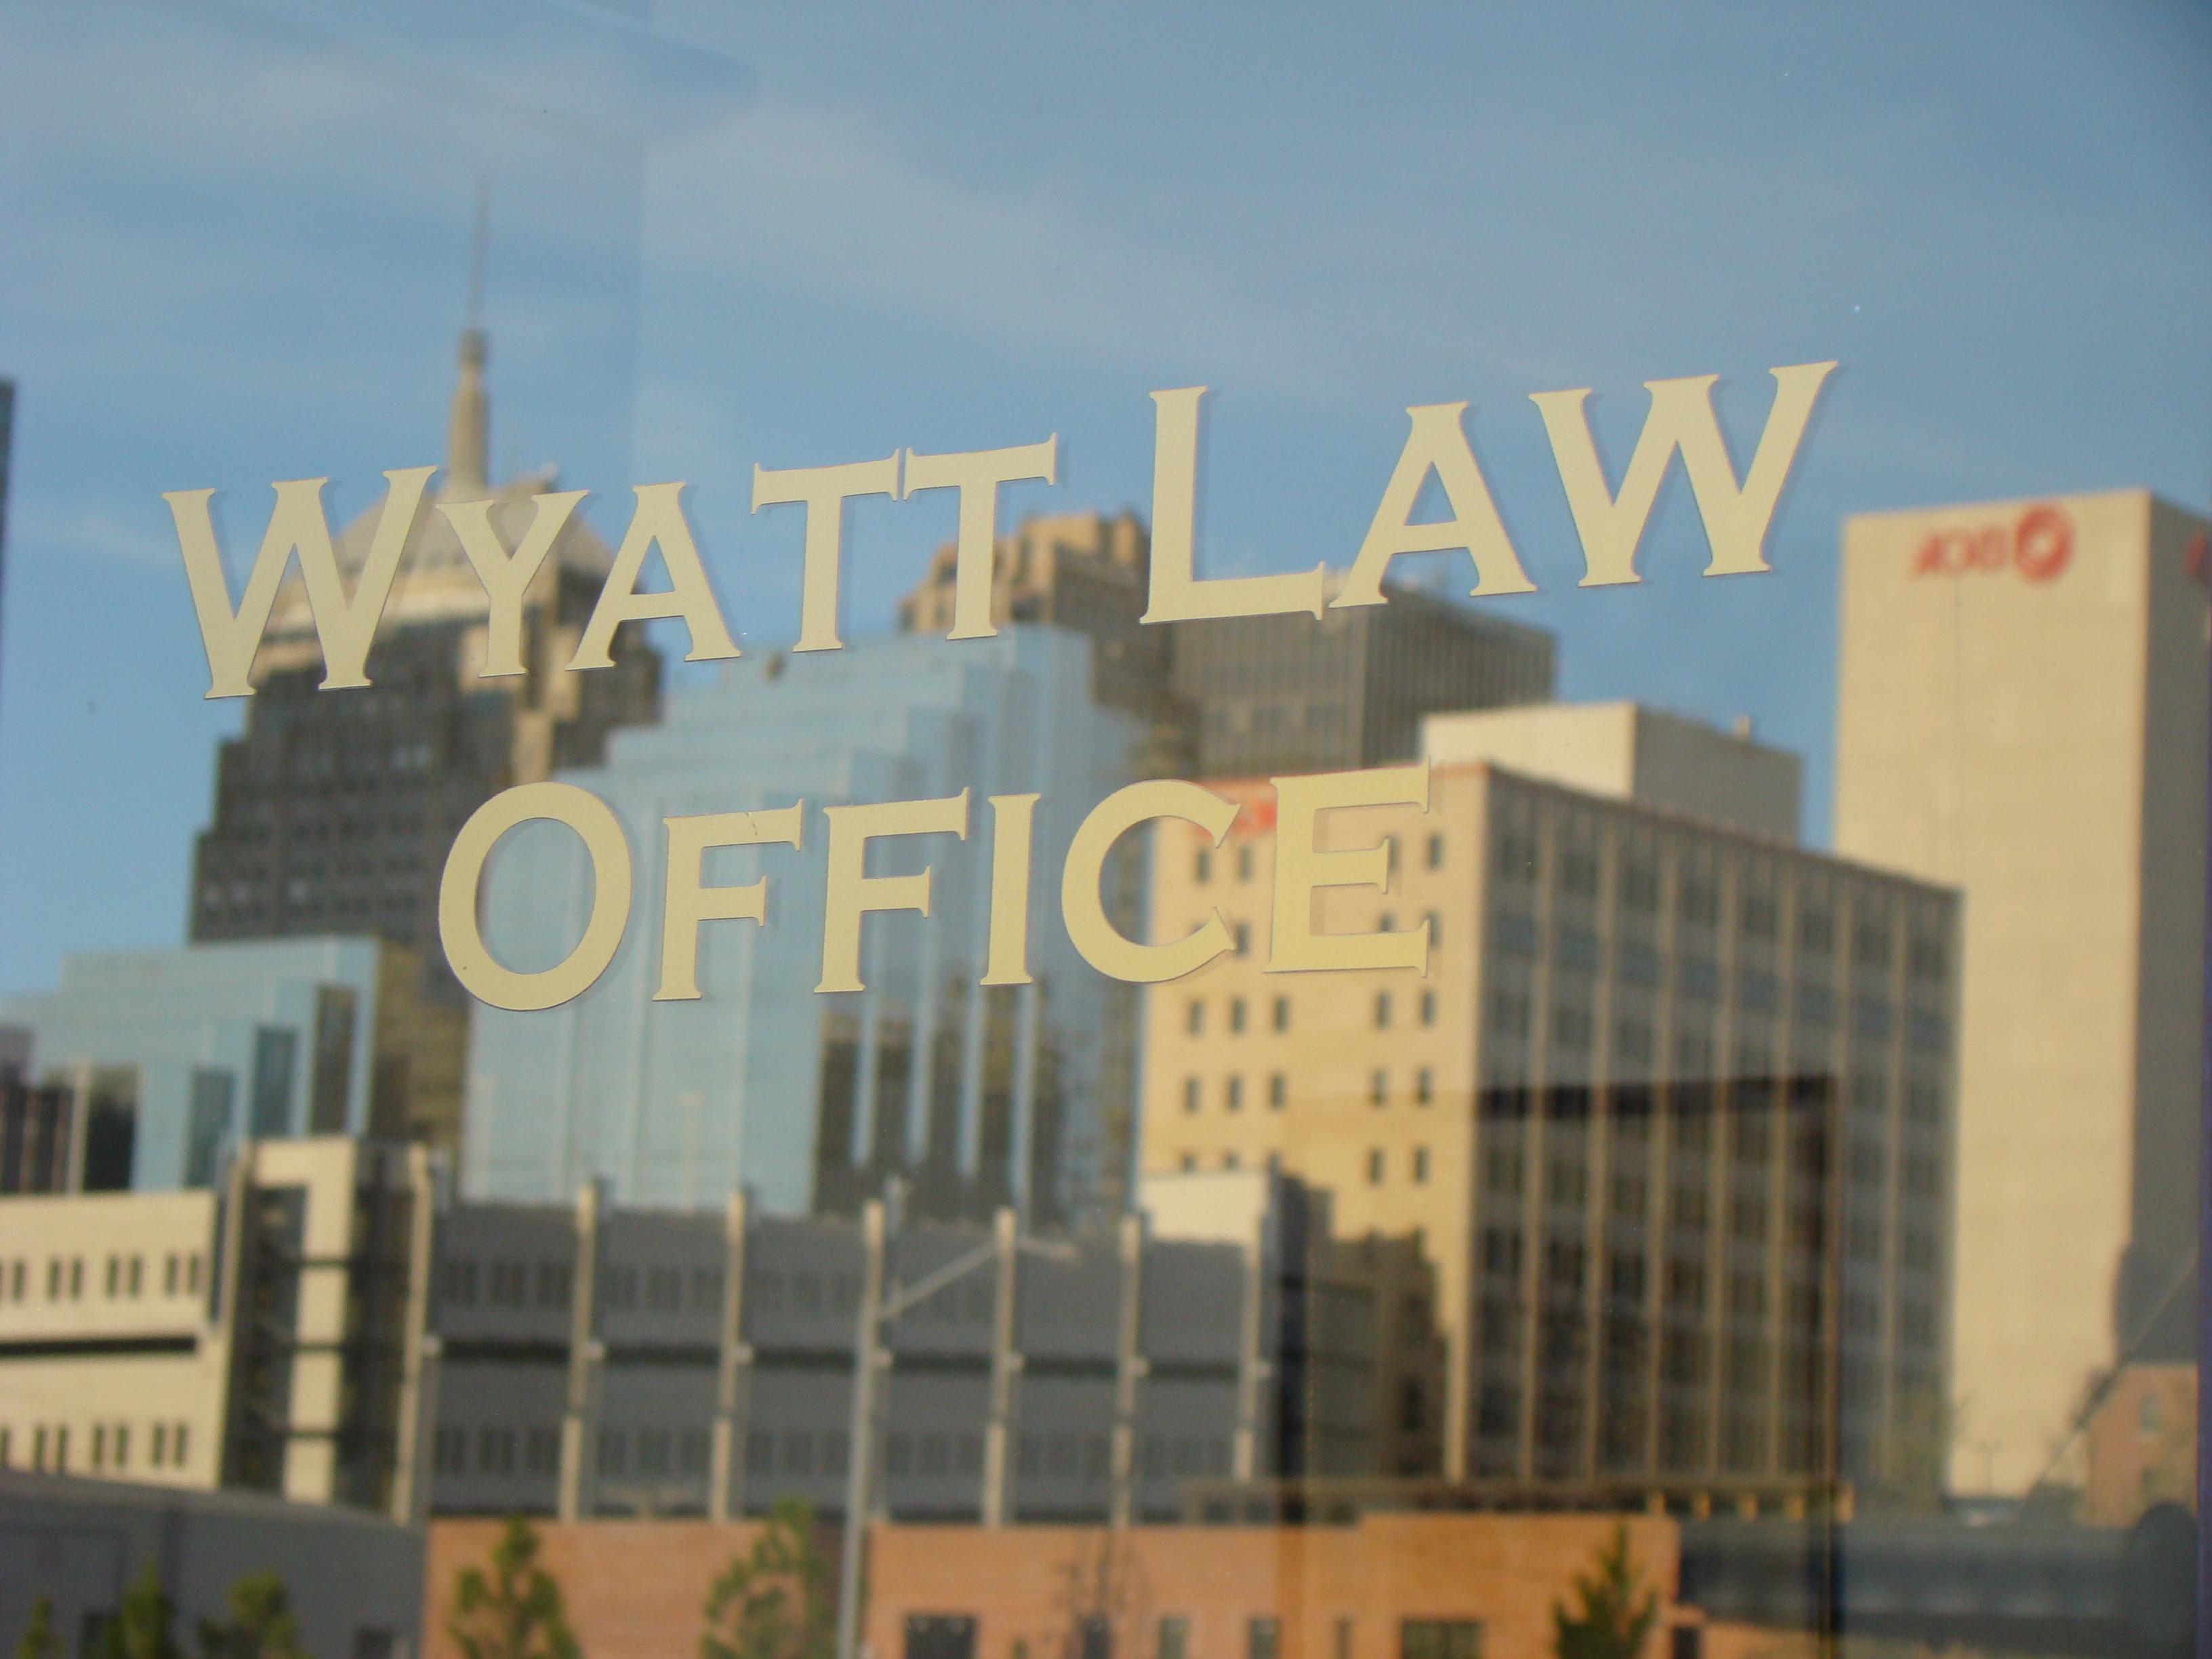 Wyatt Law Office image 1